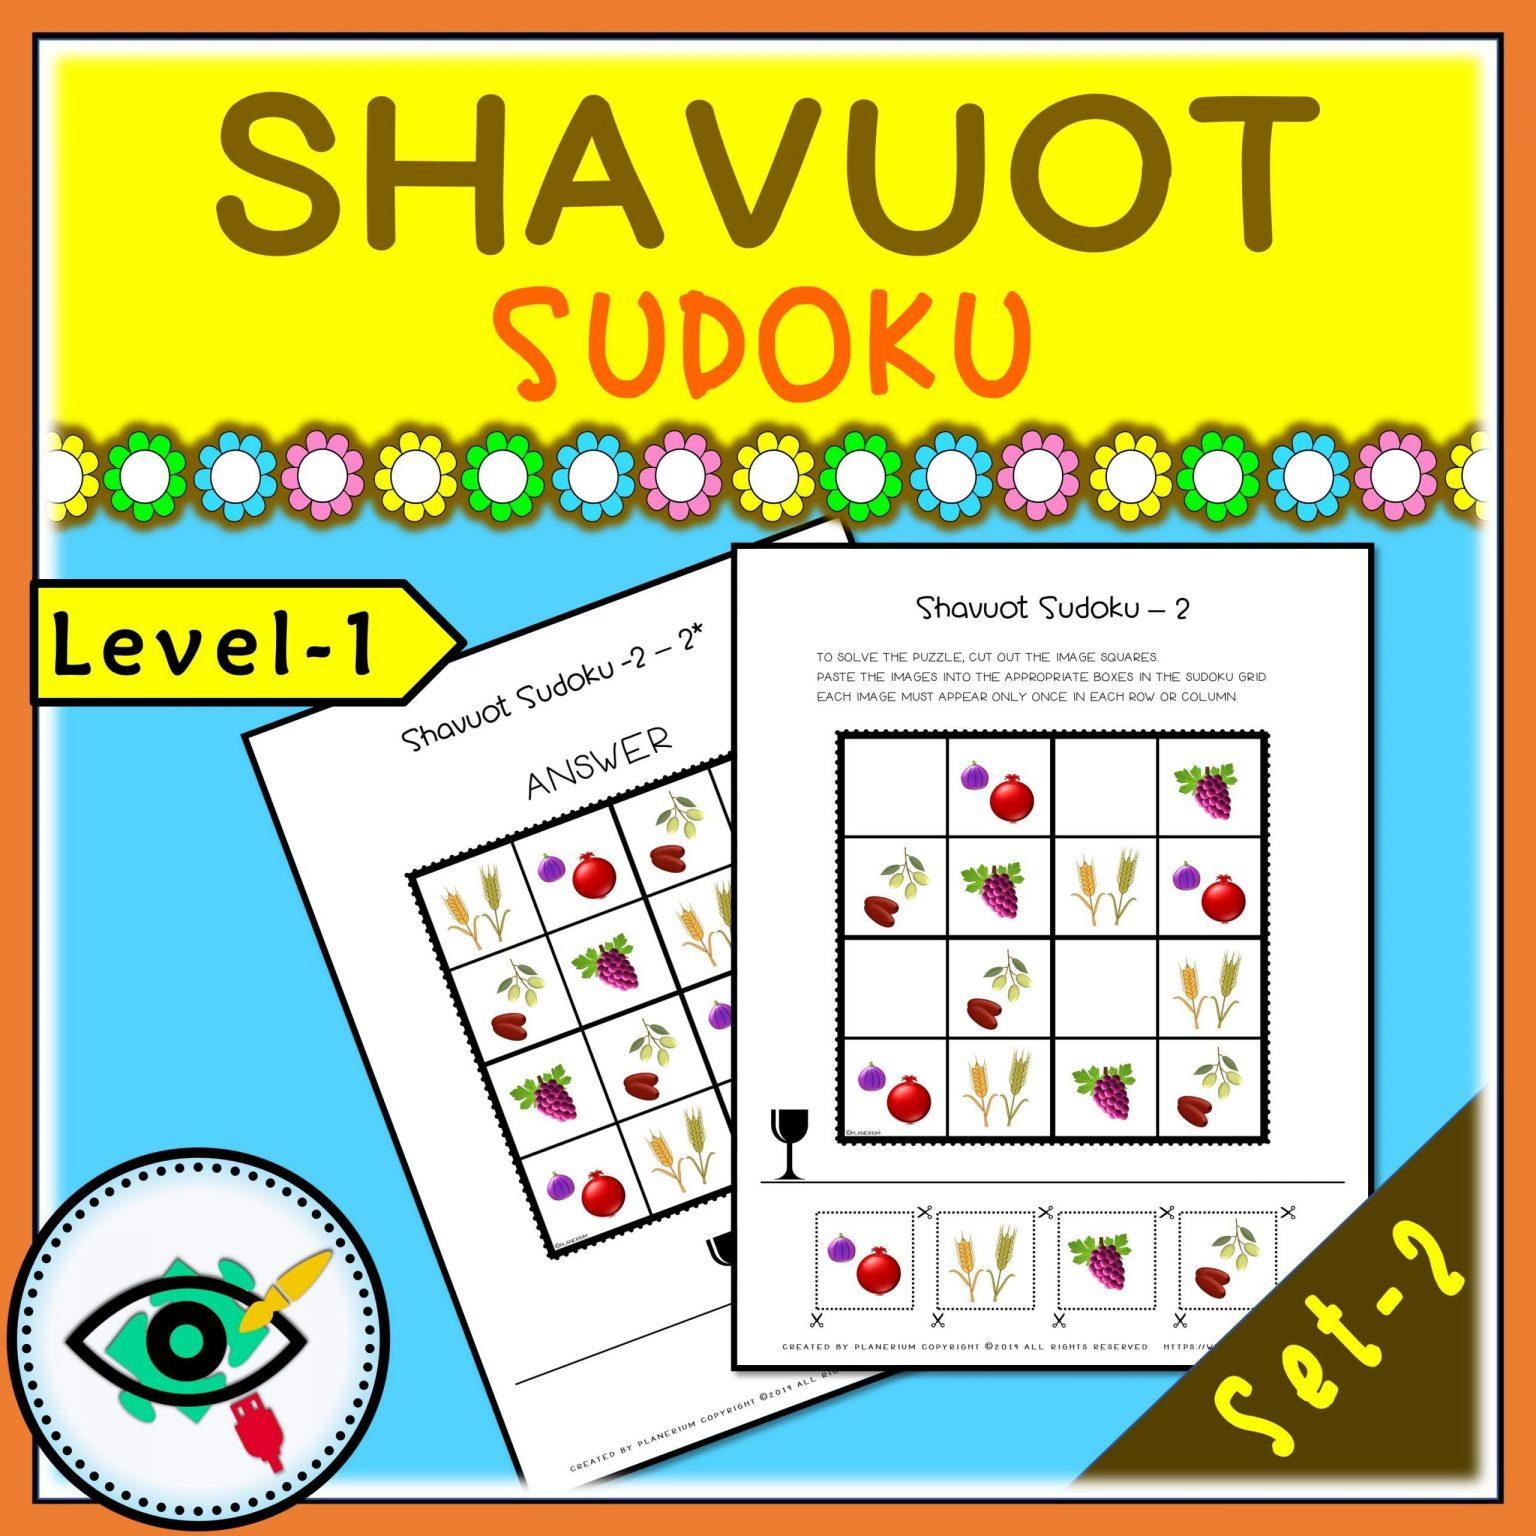 Shavuot - Sudoku Puzzle Game - Title 4